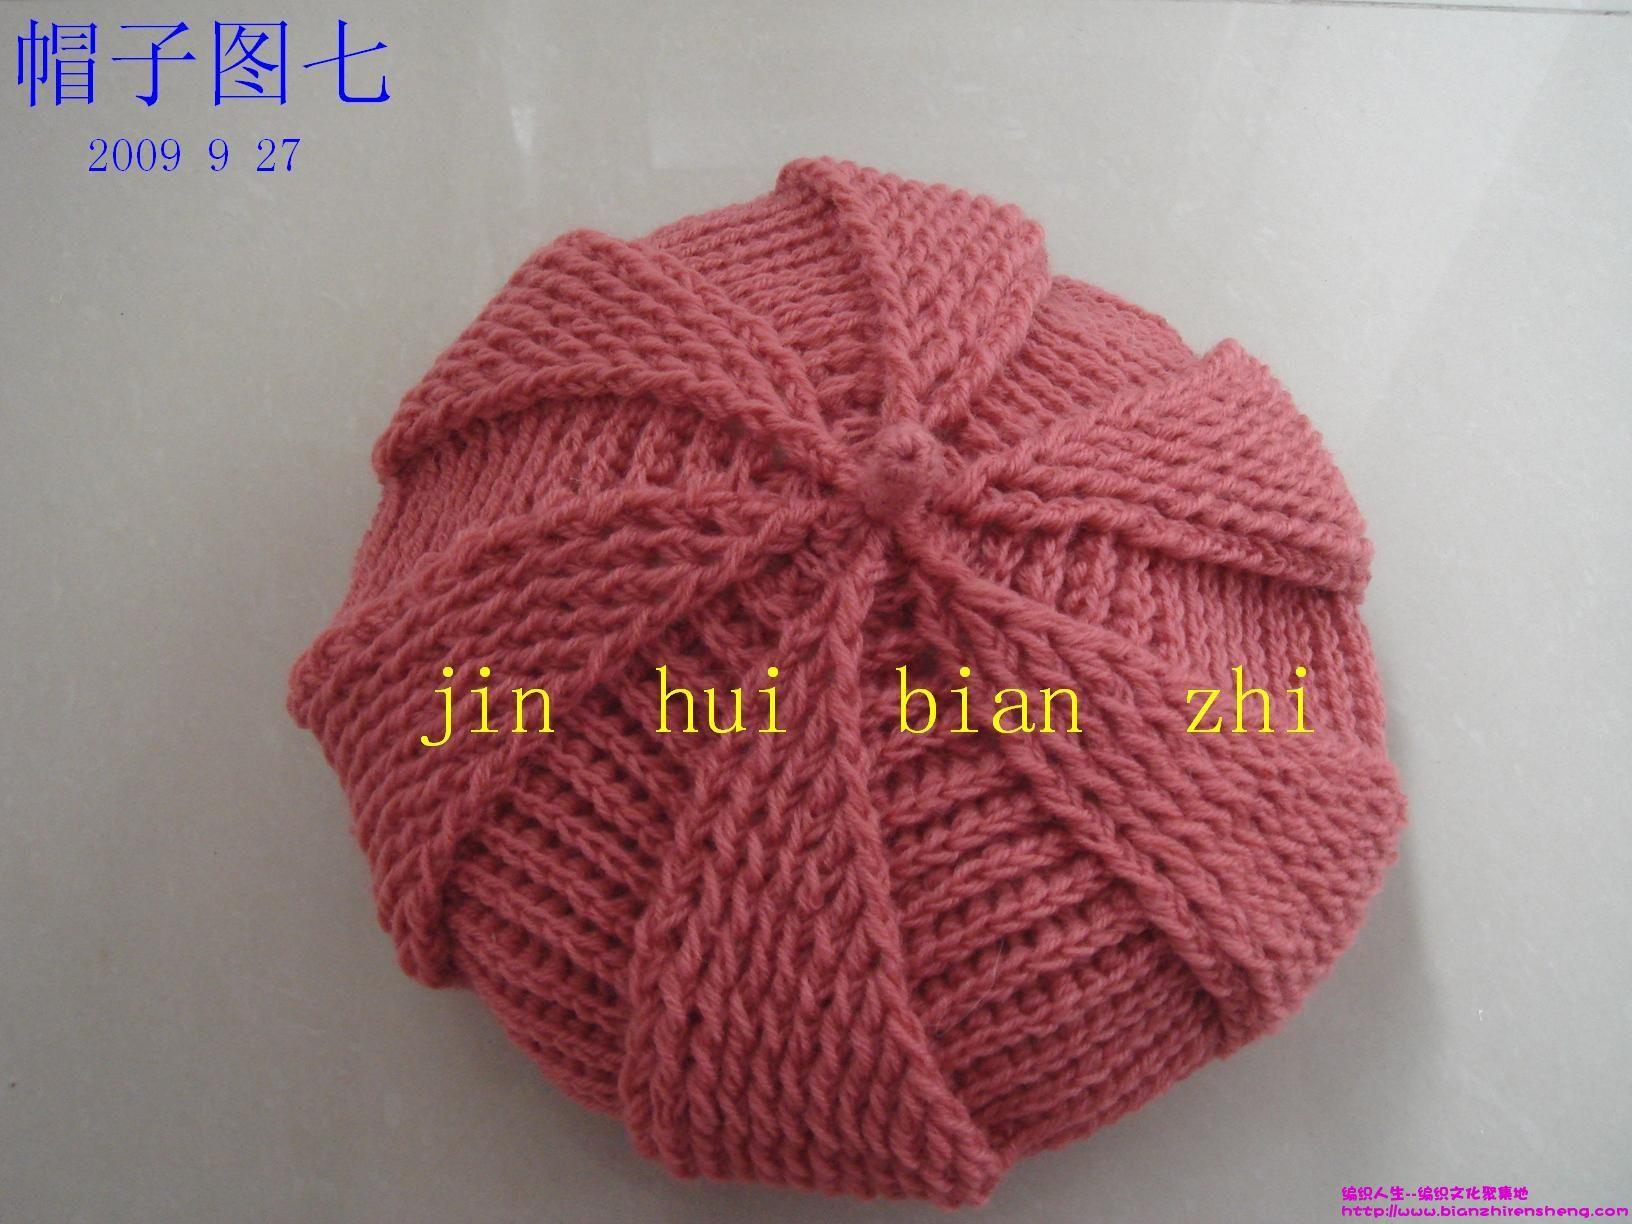 jhbz儿童帽子_编织人生论坛